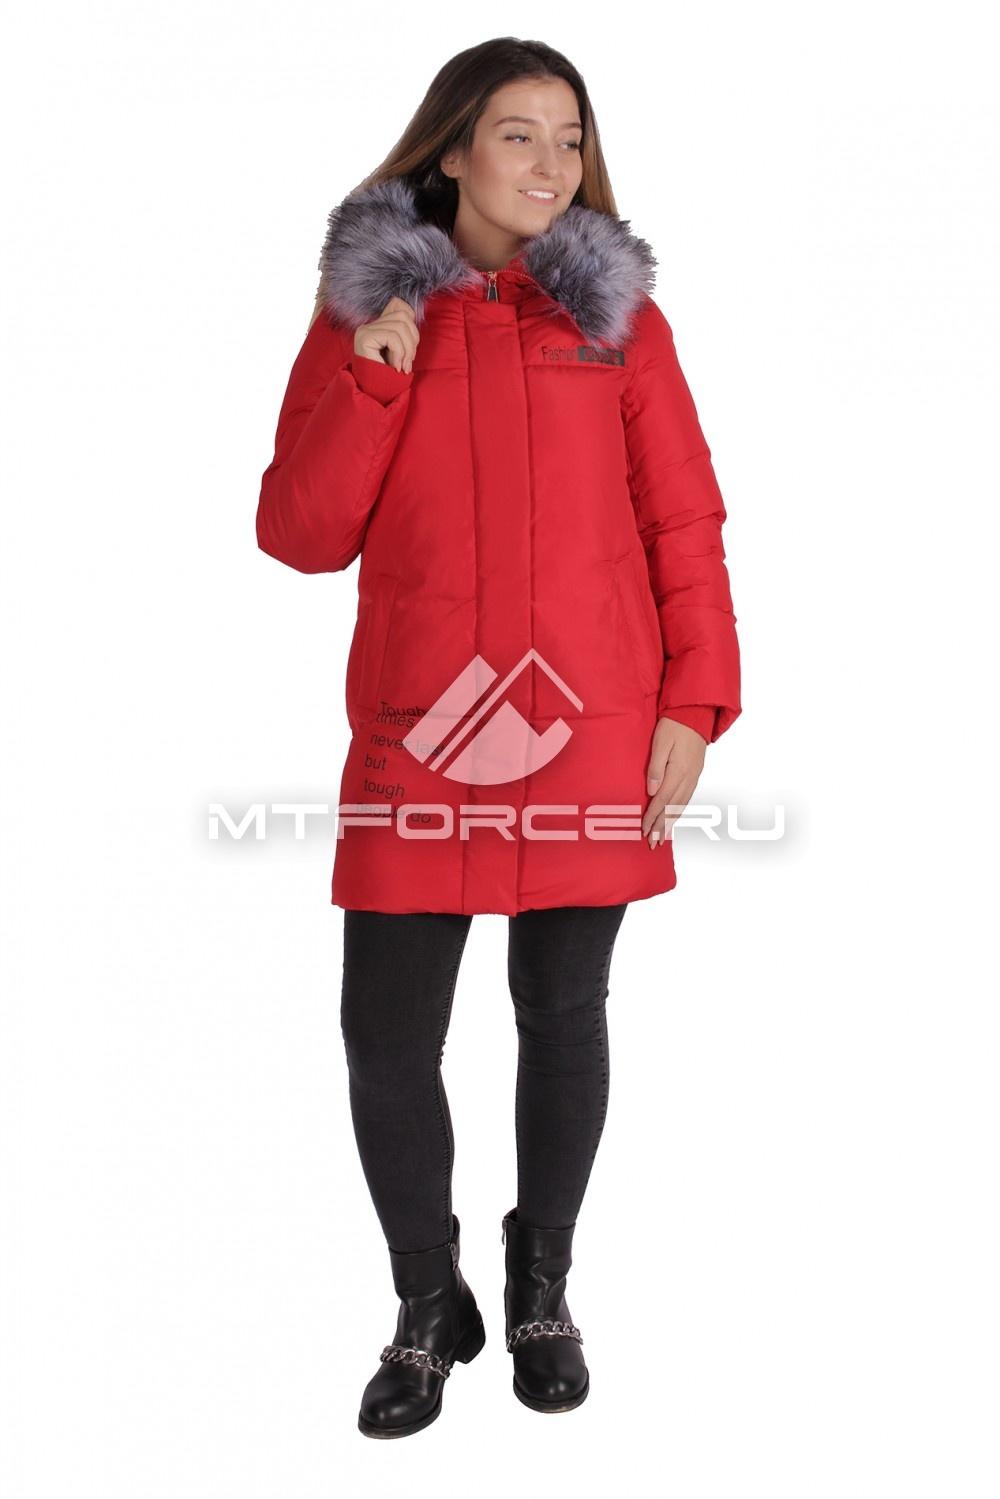 Купить                                  оптом Пуховик ТРЕНД женский зимний красного цвета 16031Kr в Новосибирске